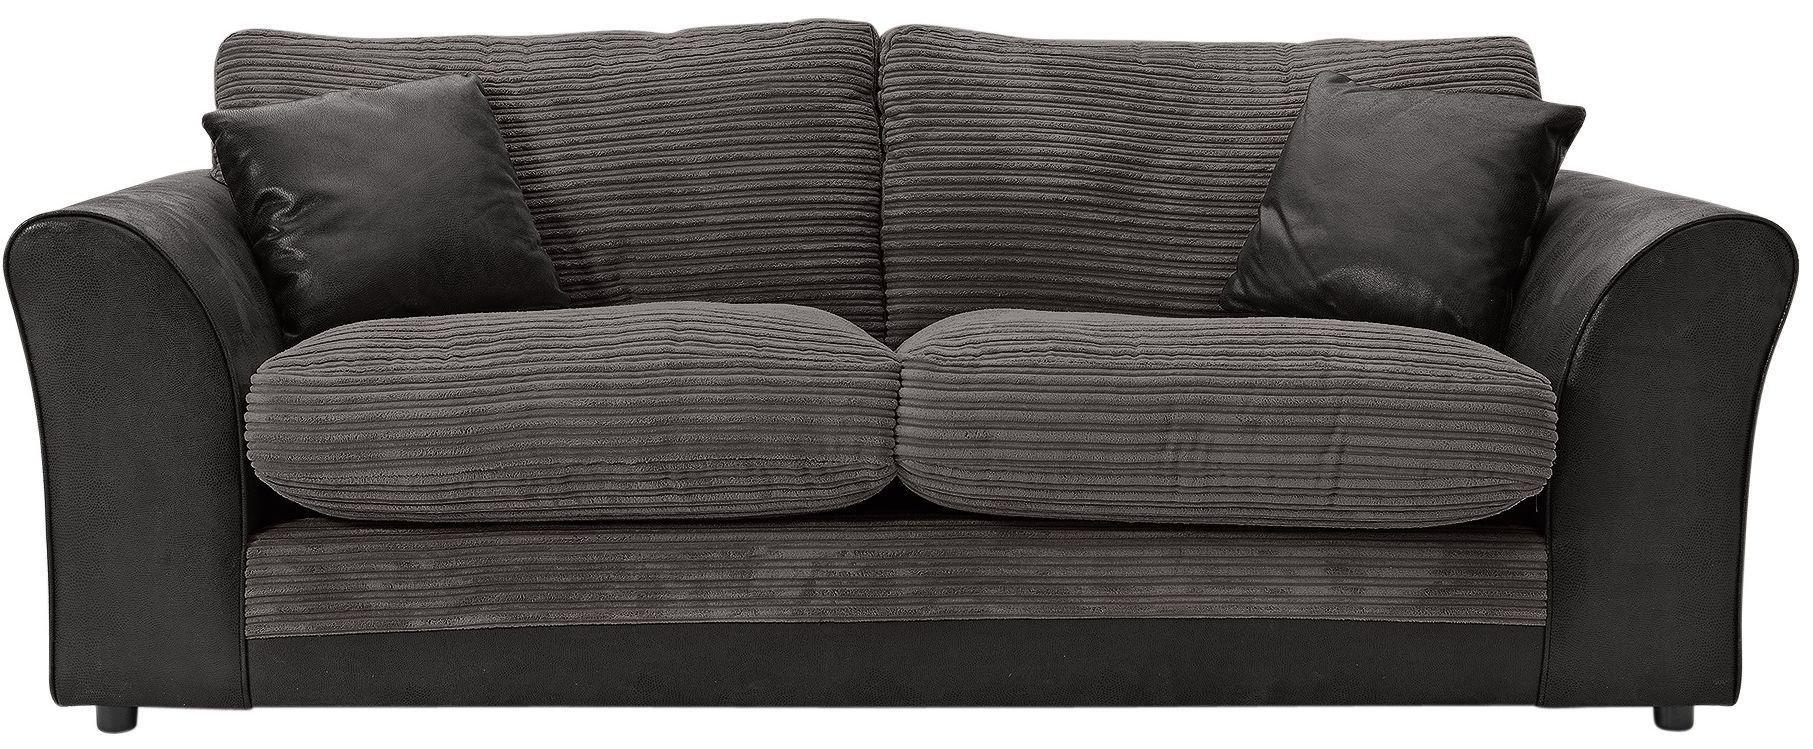 HOME - Harley 3 Seater - Fabric Sofa - Charcoal